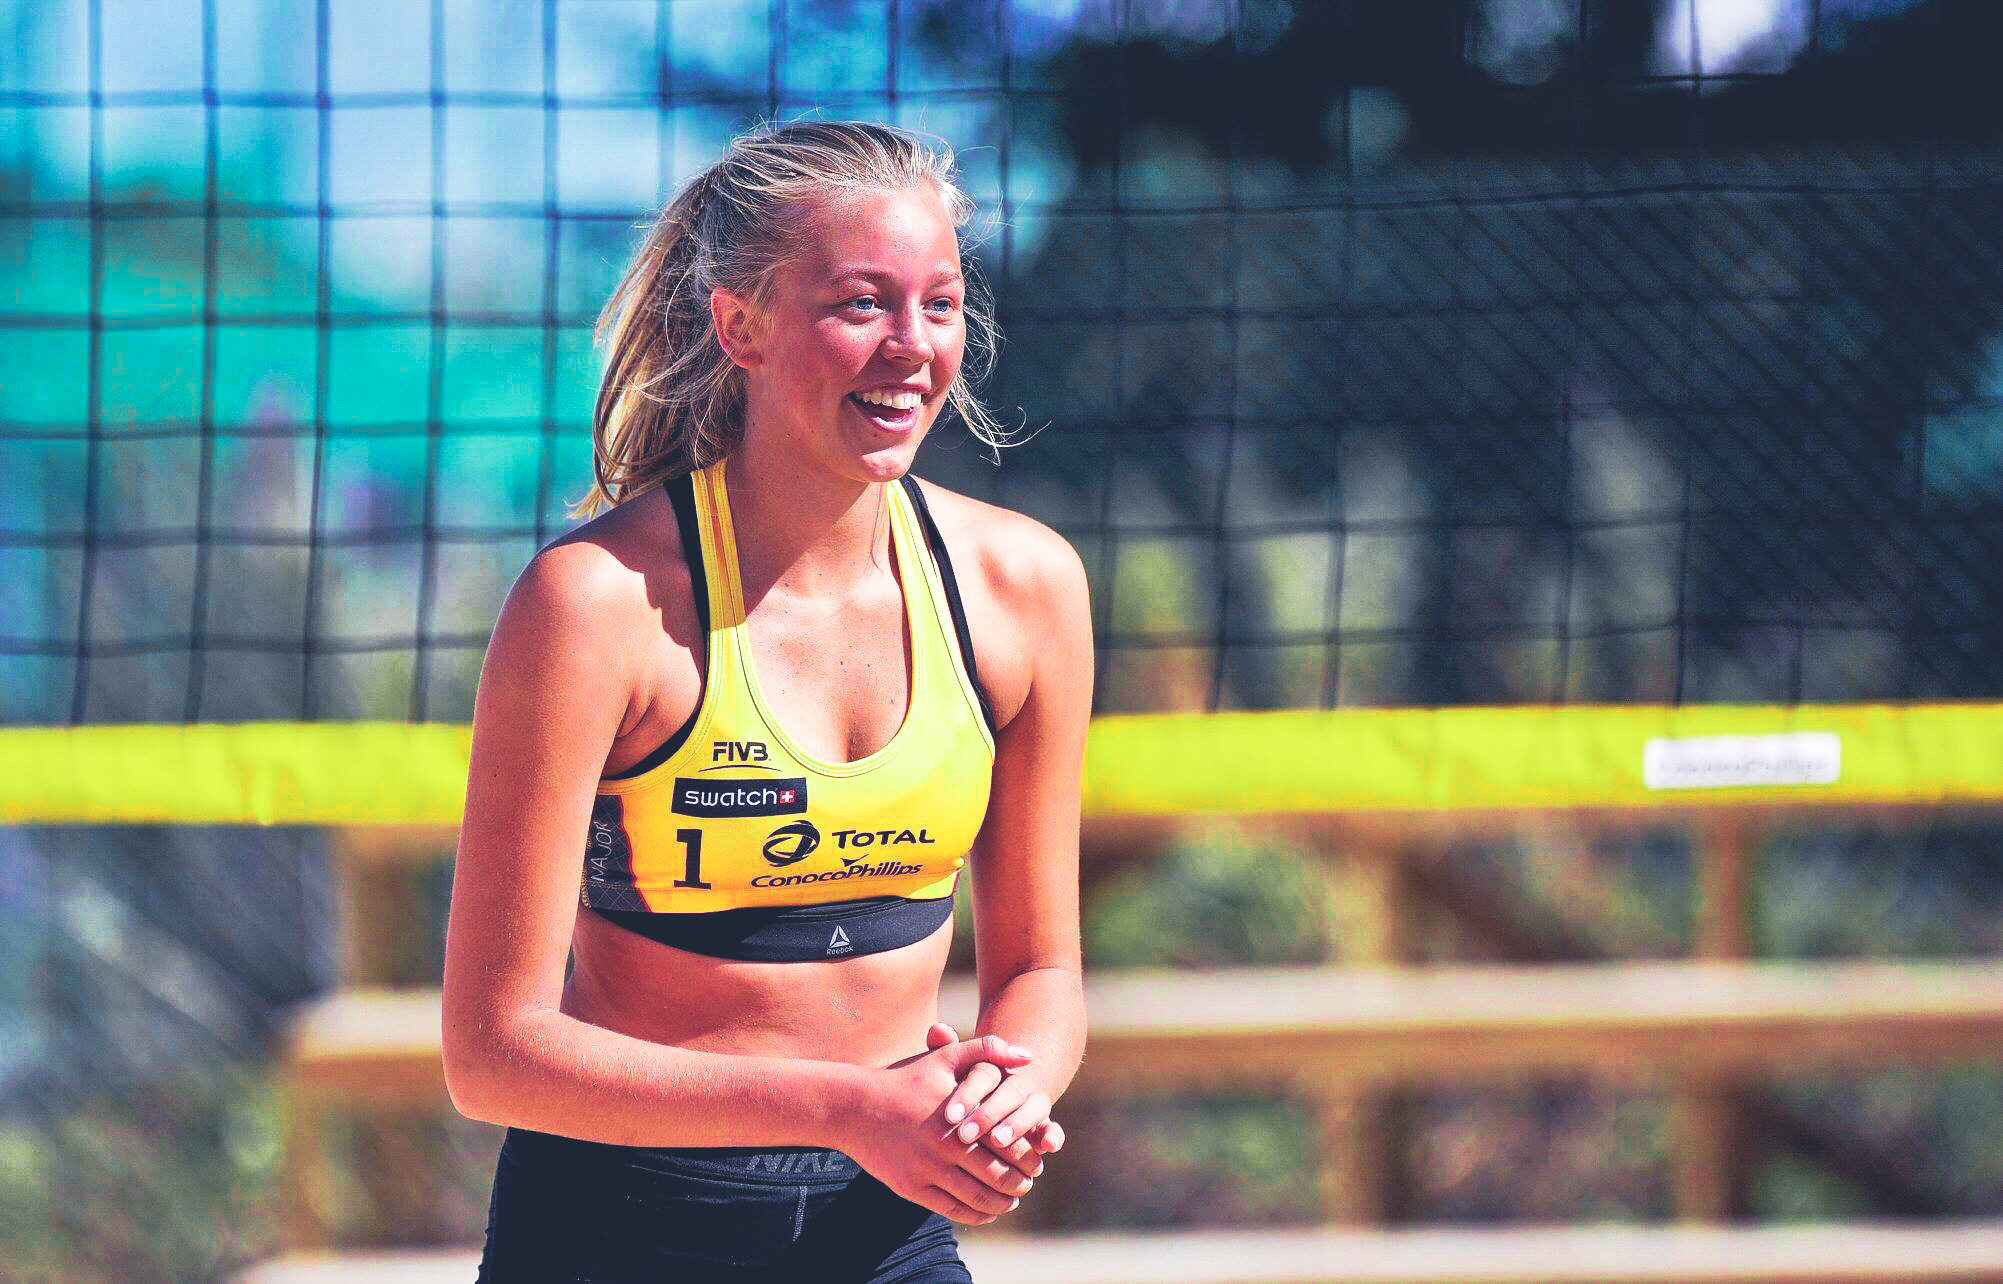 Maria Åsmul - Maria kan vise til gode resultat i volleyball- og sandvolleyballidretten og går no på Toppvolley Norge i Suldal kommune. Ho er med på U-17 landslaget både i volleyball og i sandvolleyball.Maria mottek eit ungdomsstipend på kr. 25.000,- til vidare utvikling, kostnader knytt til reise, treningssamlingar og konkurransar. Me ønskjer deg lykke til vidare!